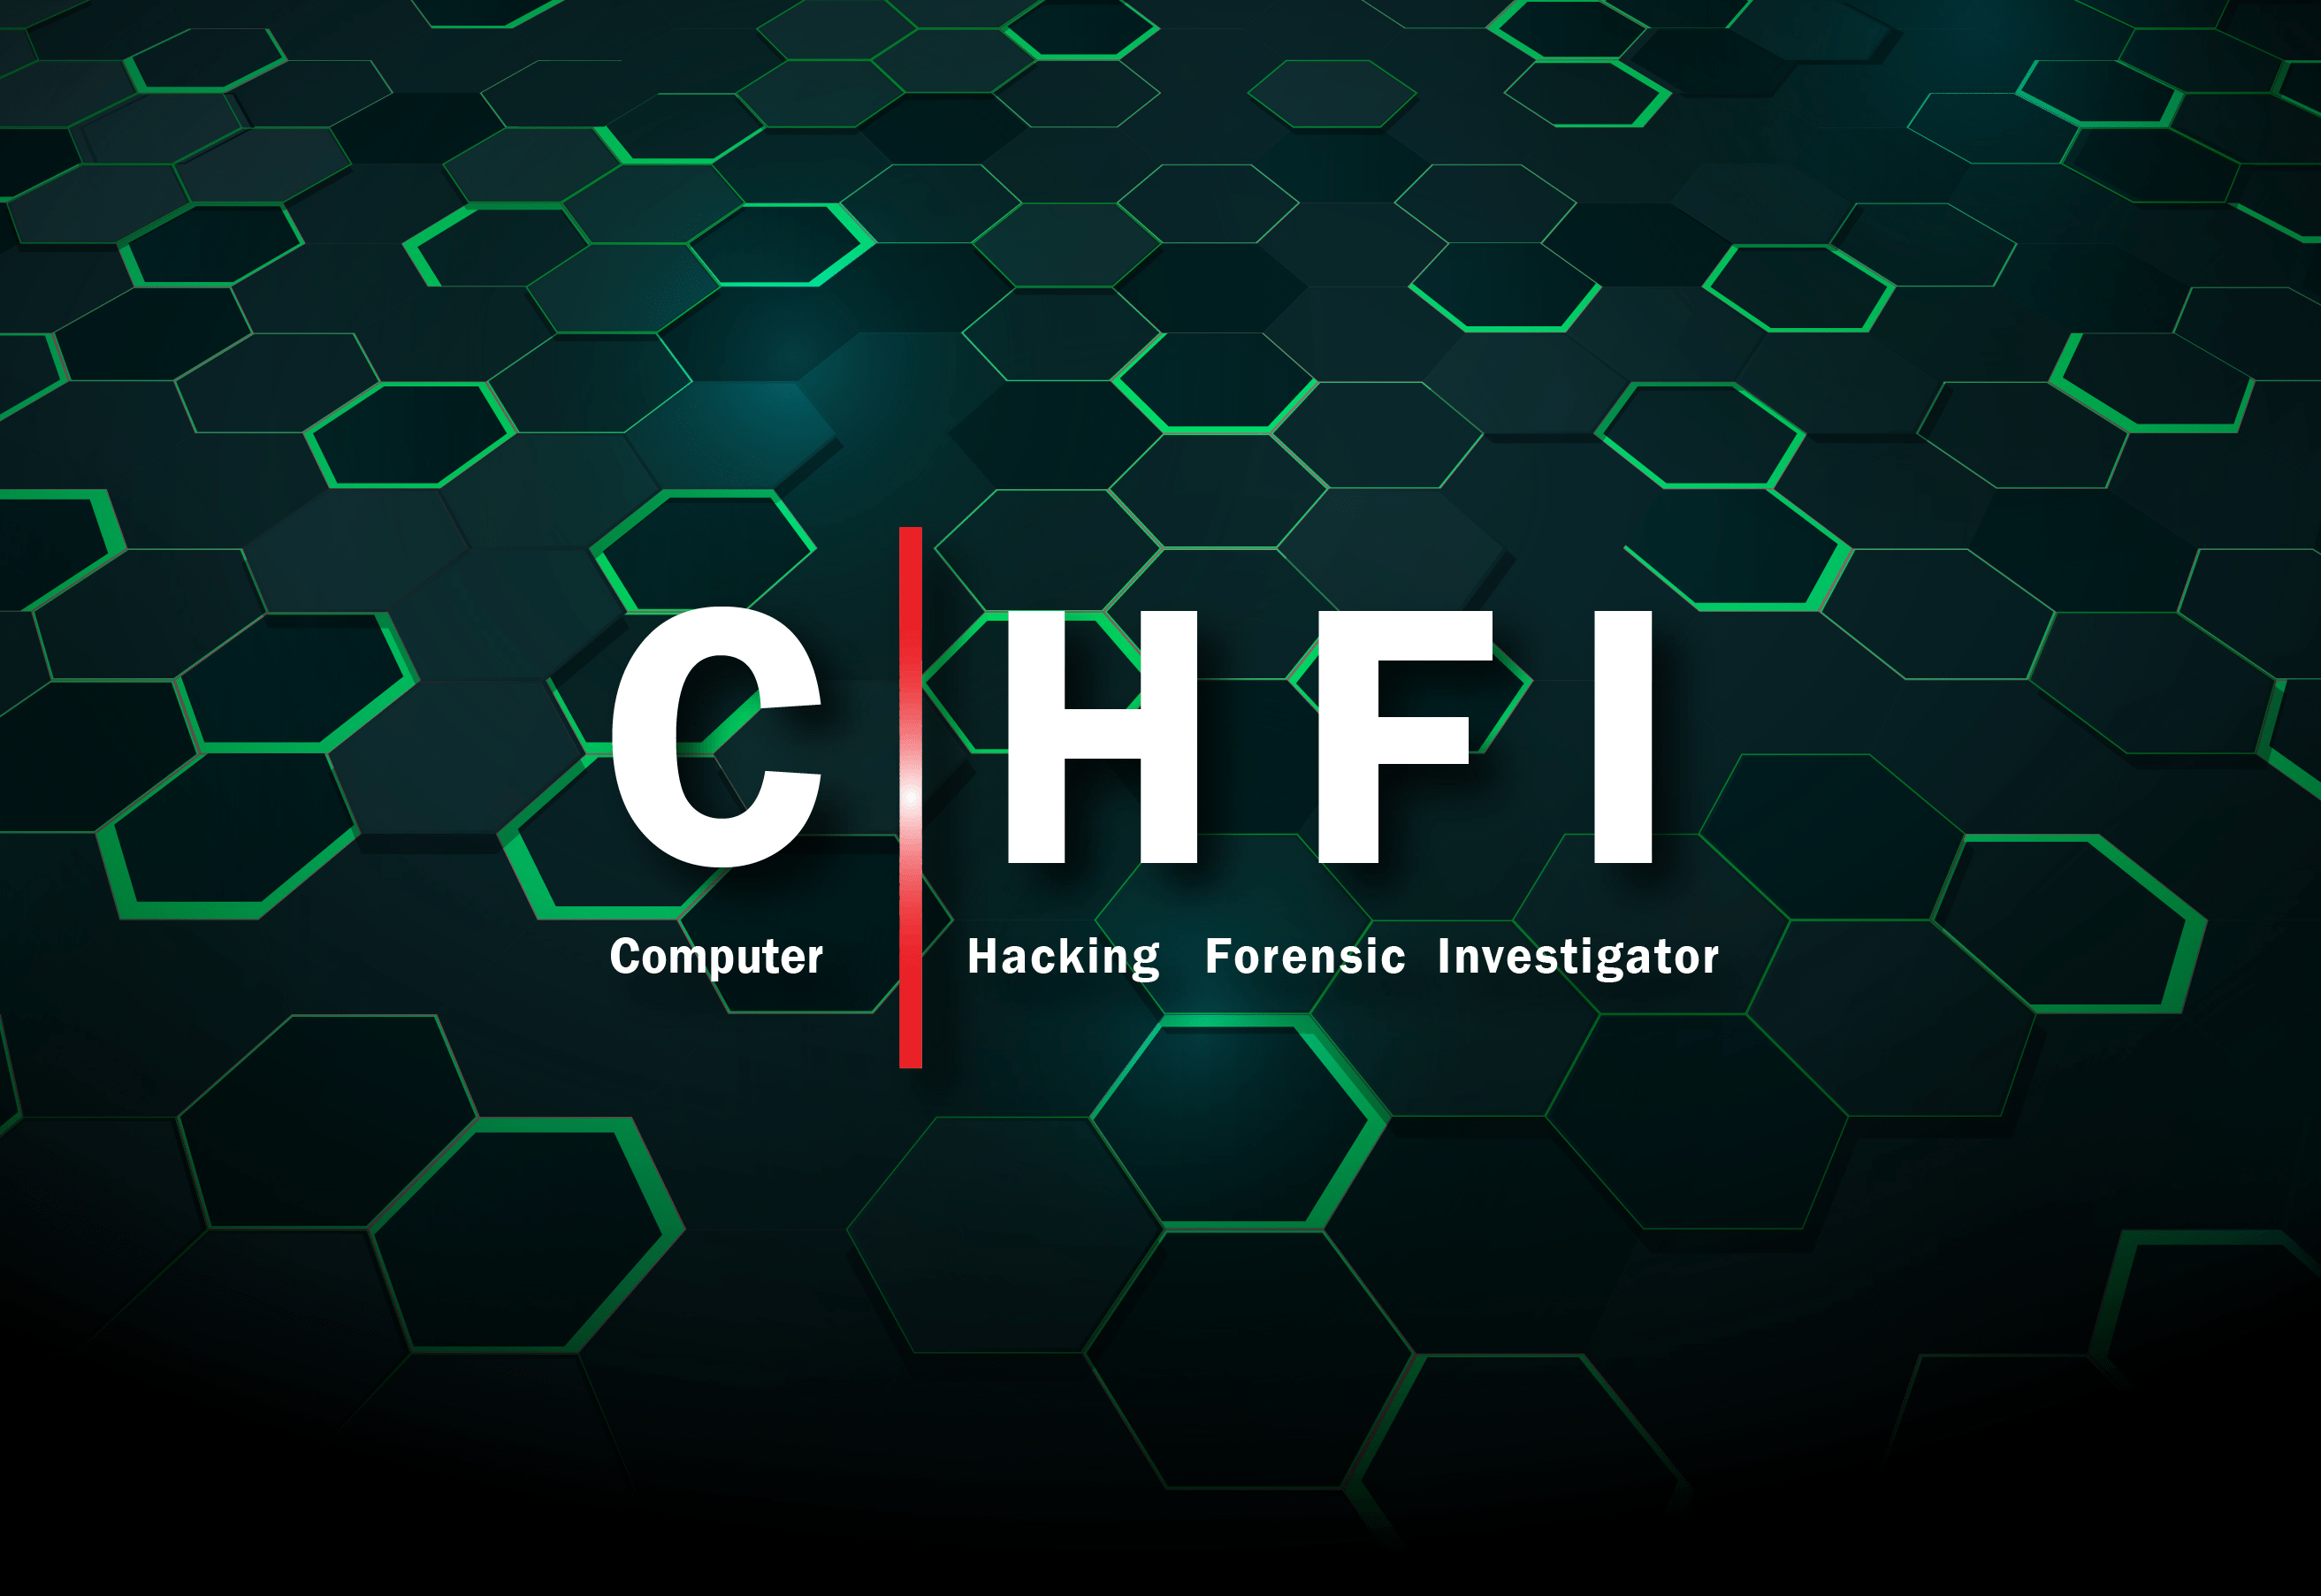 Computer Hacking Forensic Investigator – CHFI. v9